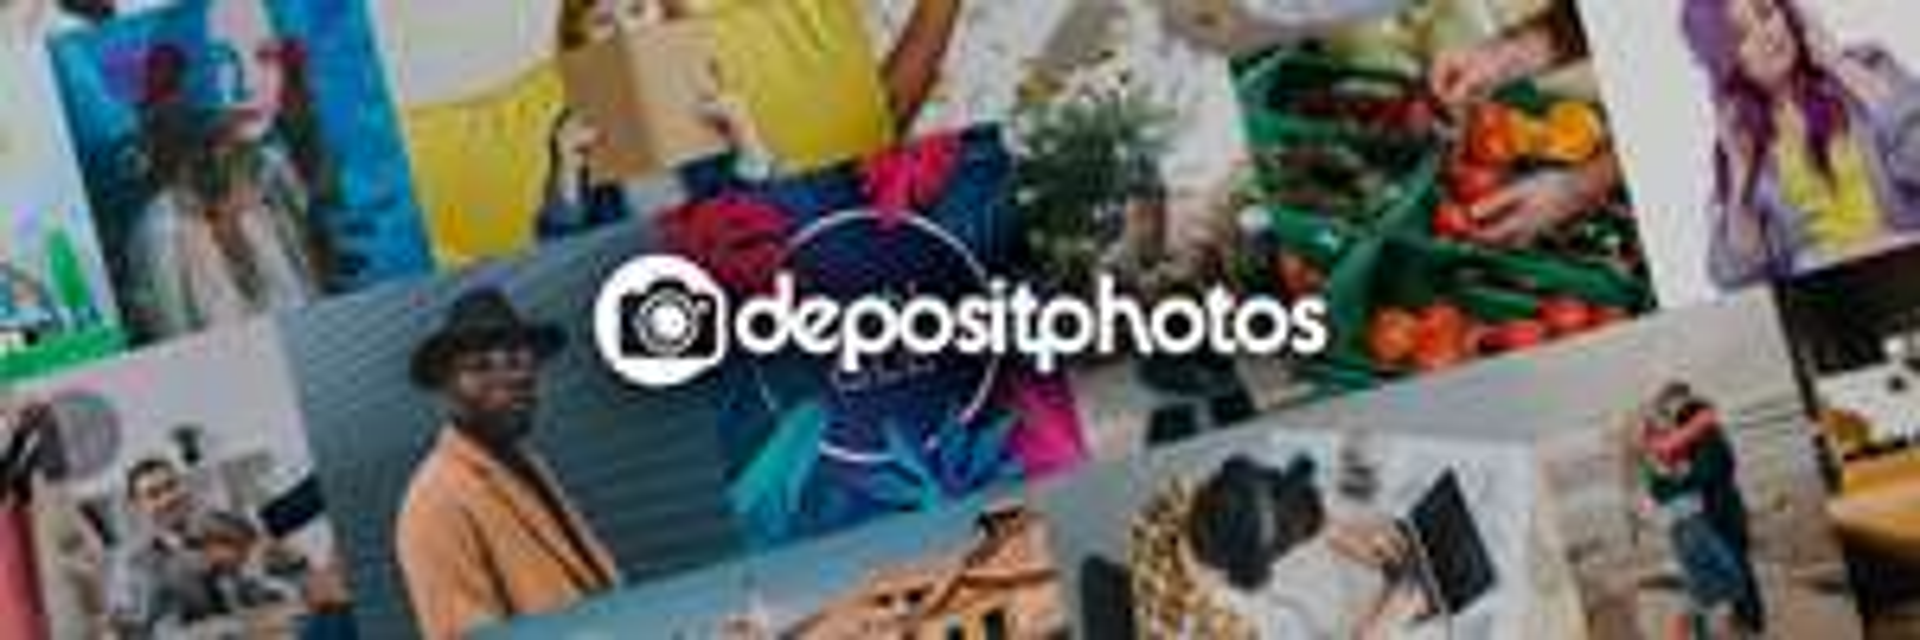 [Depositphotos] 100 Stockfotos/Vektorgrafiken jeder Größe für 49$ (lebenslang gültige Credits, kein Abo)